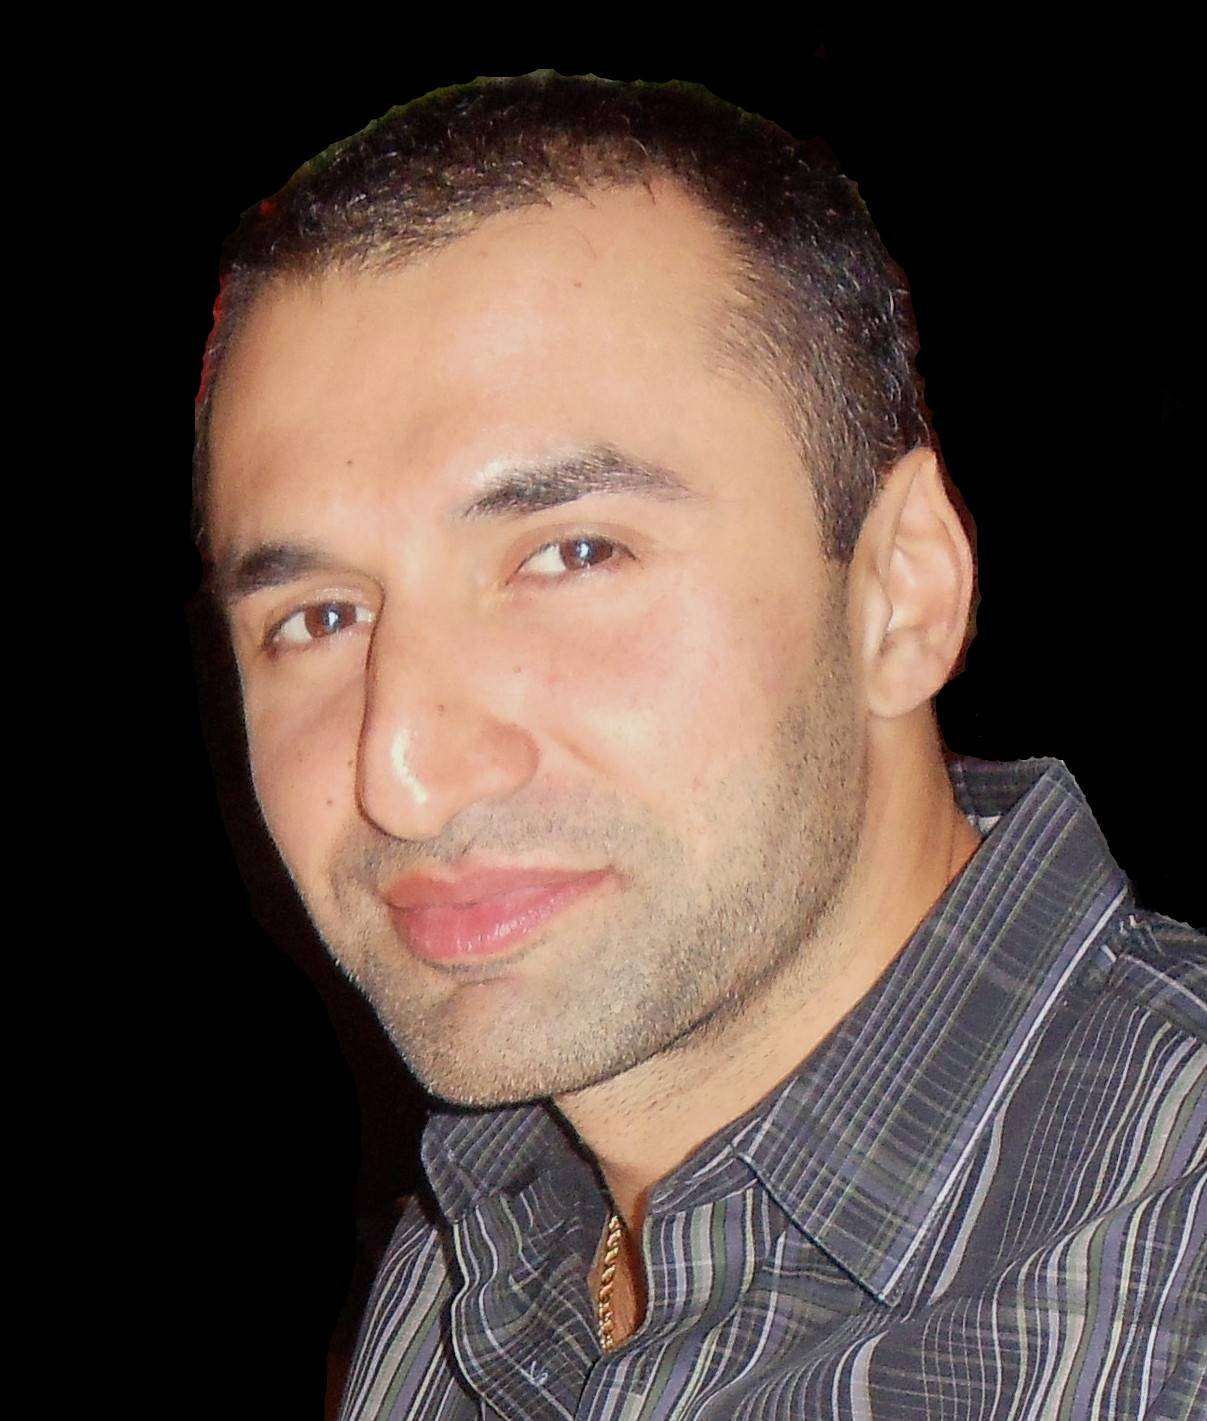 Dr._Bababekov